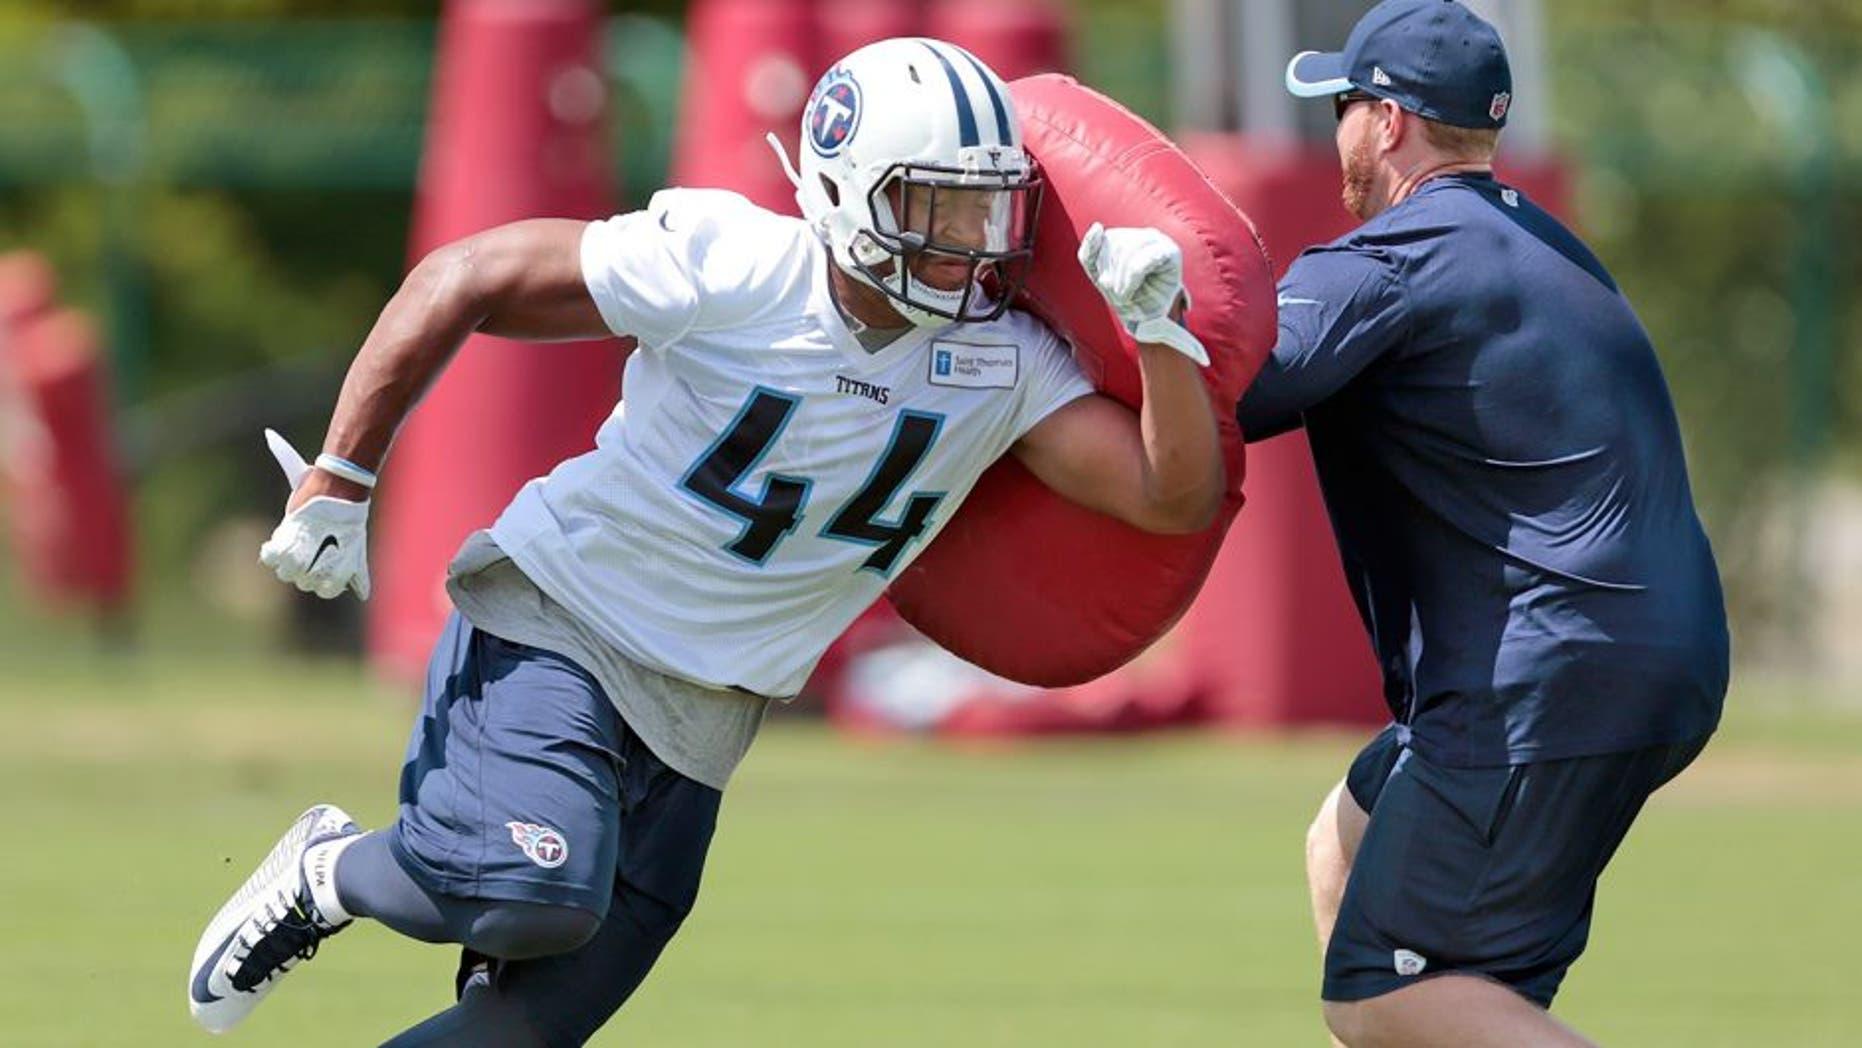 Tennessee Titans running back David Cobb (44) runs a drill during NFL football minicamp on Tuesday, June 16, 2015, in Nashville, Tenn. (AP Photo/Mark Humphrey)